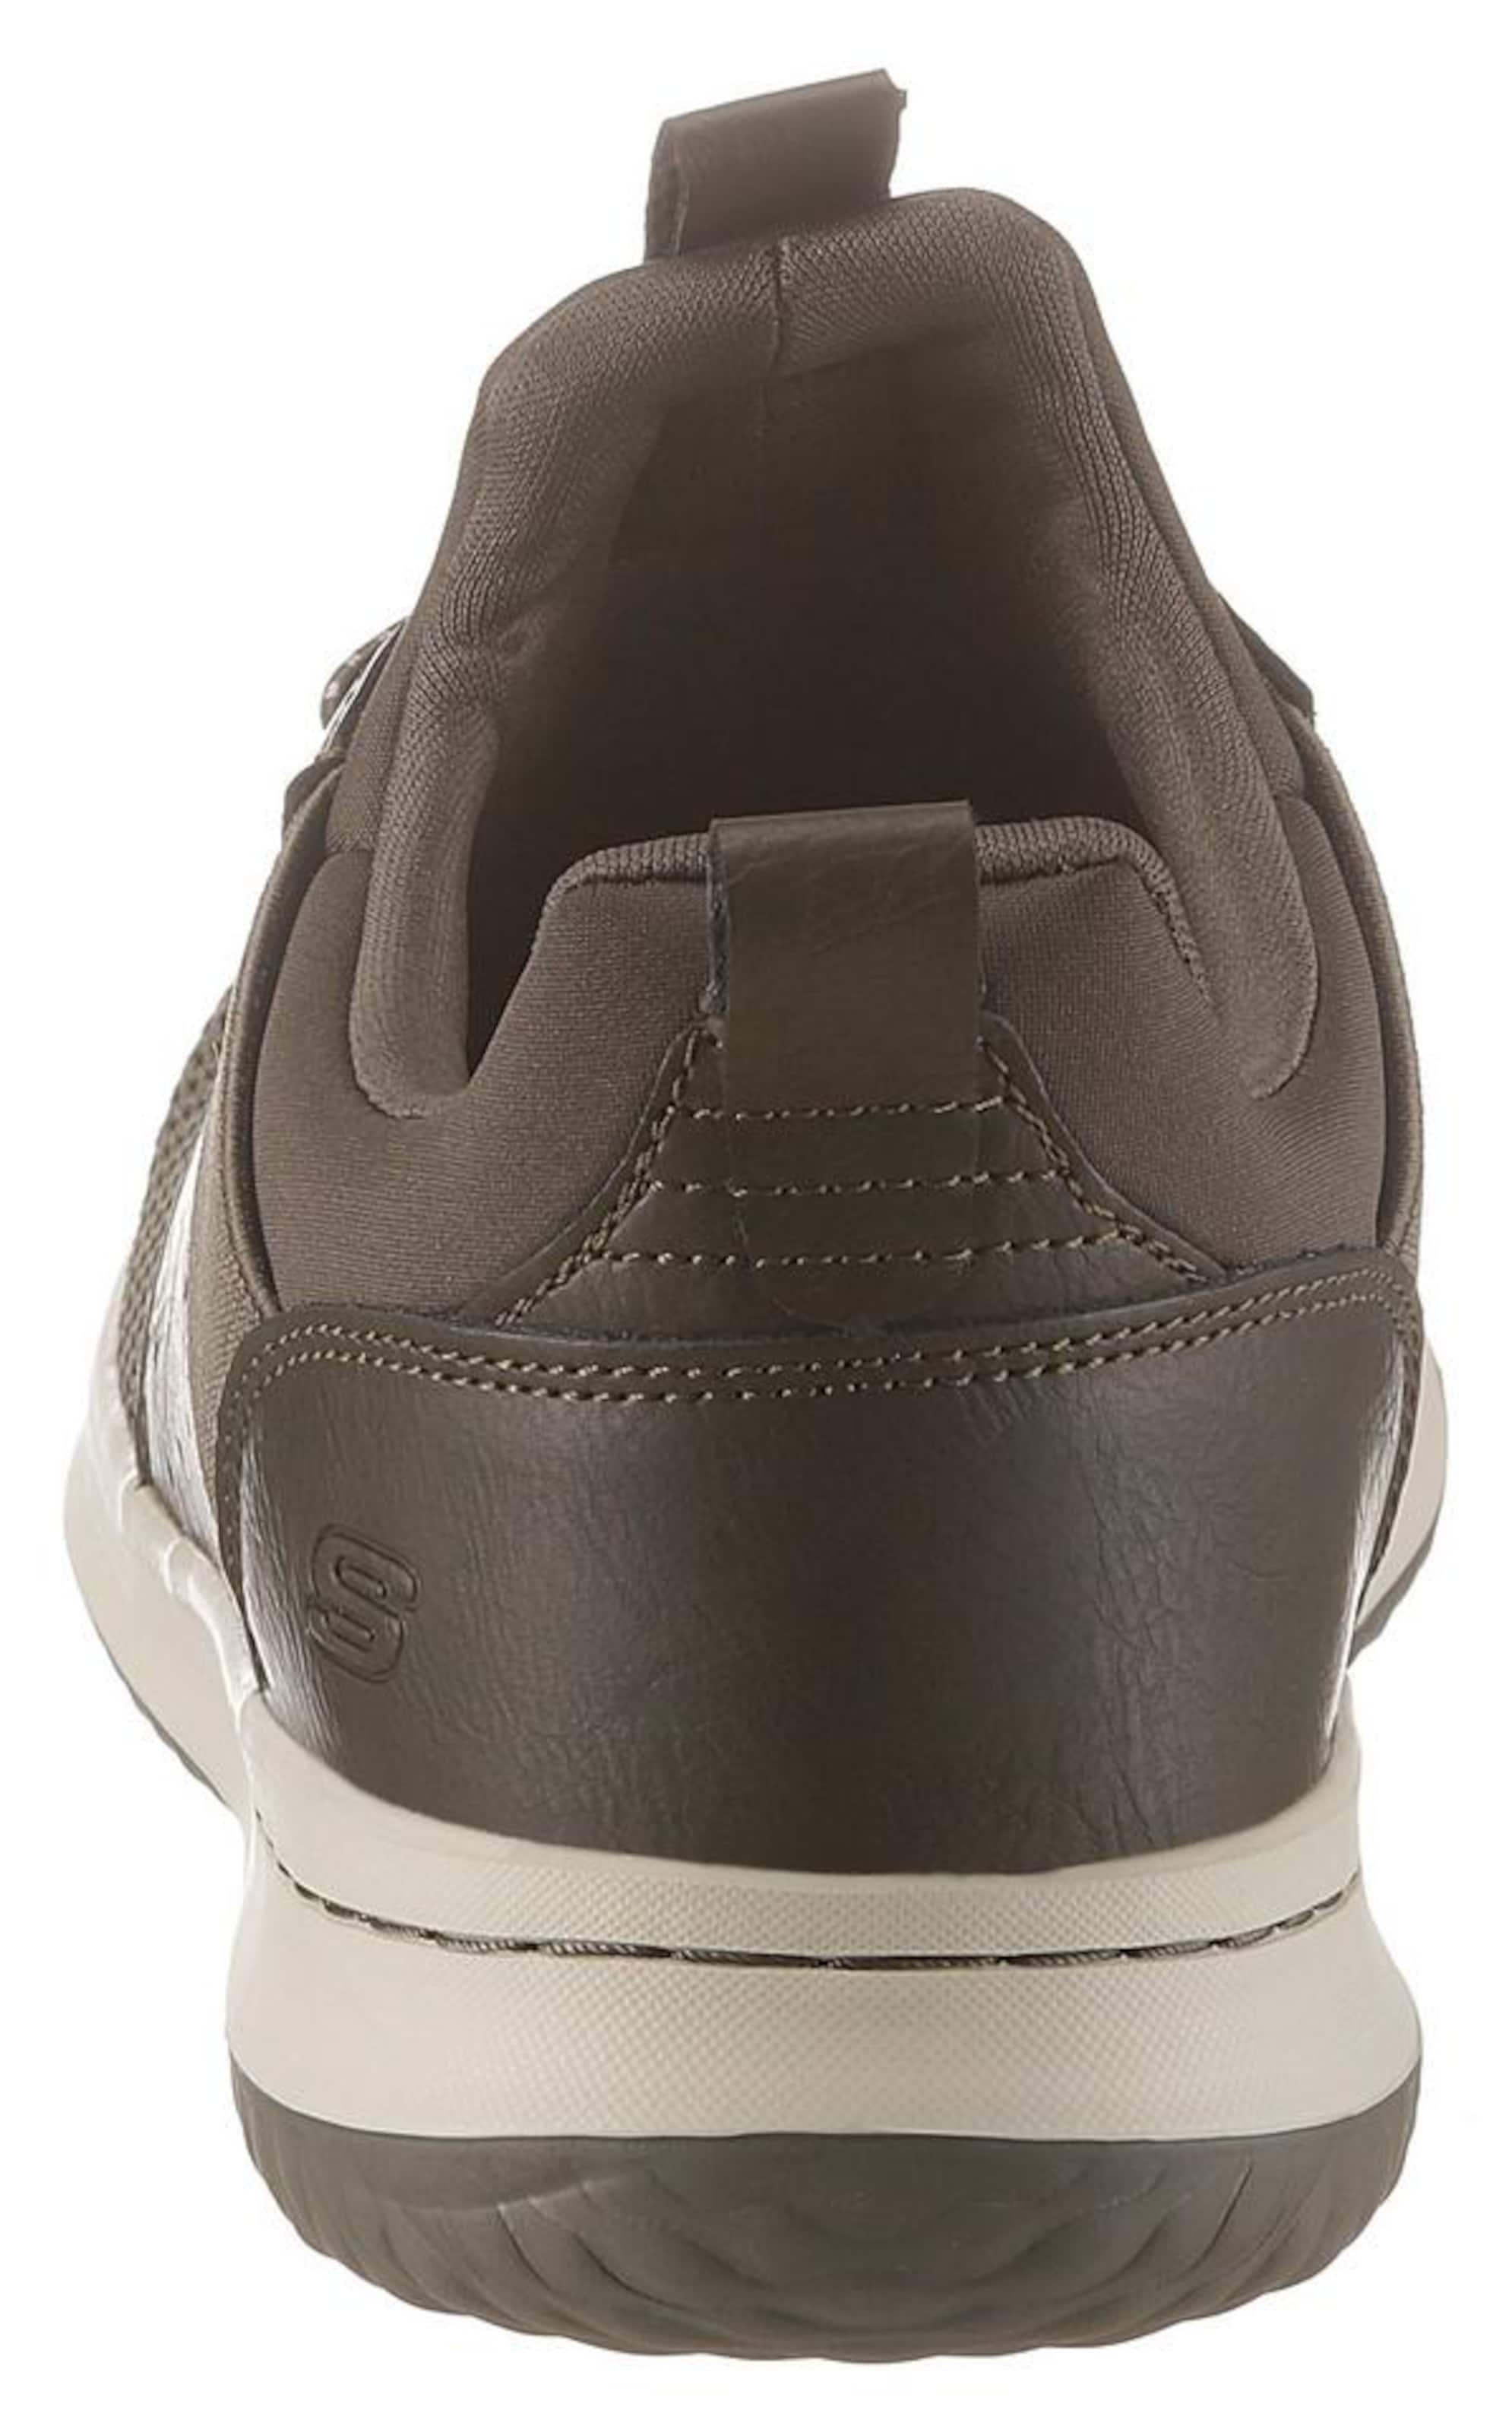 Skechers In Camben' Sneaker Oliv 'delson Yb6f7yg